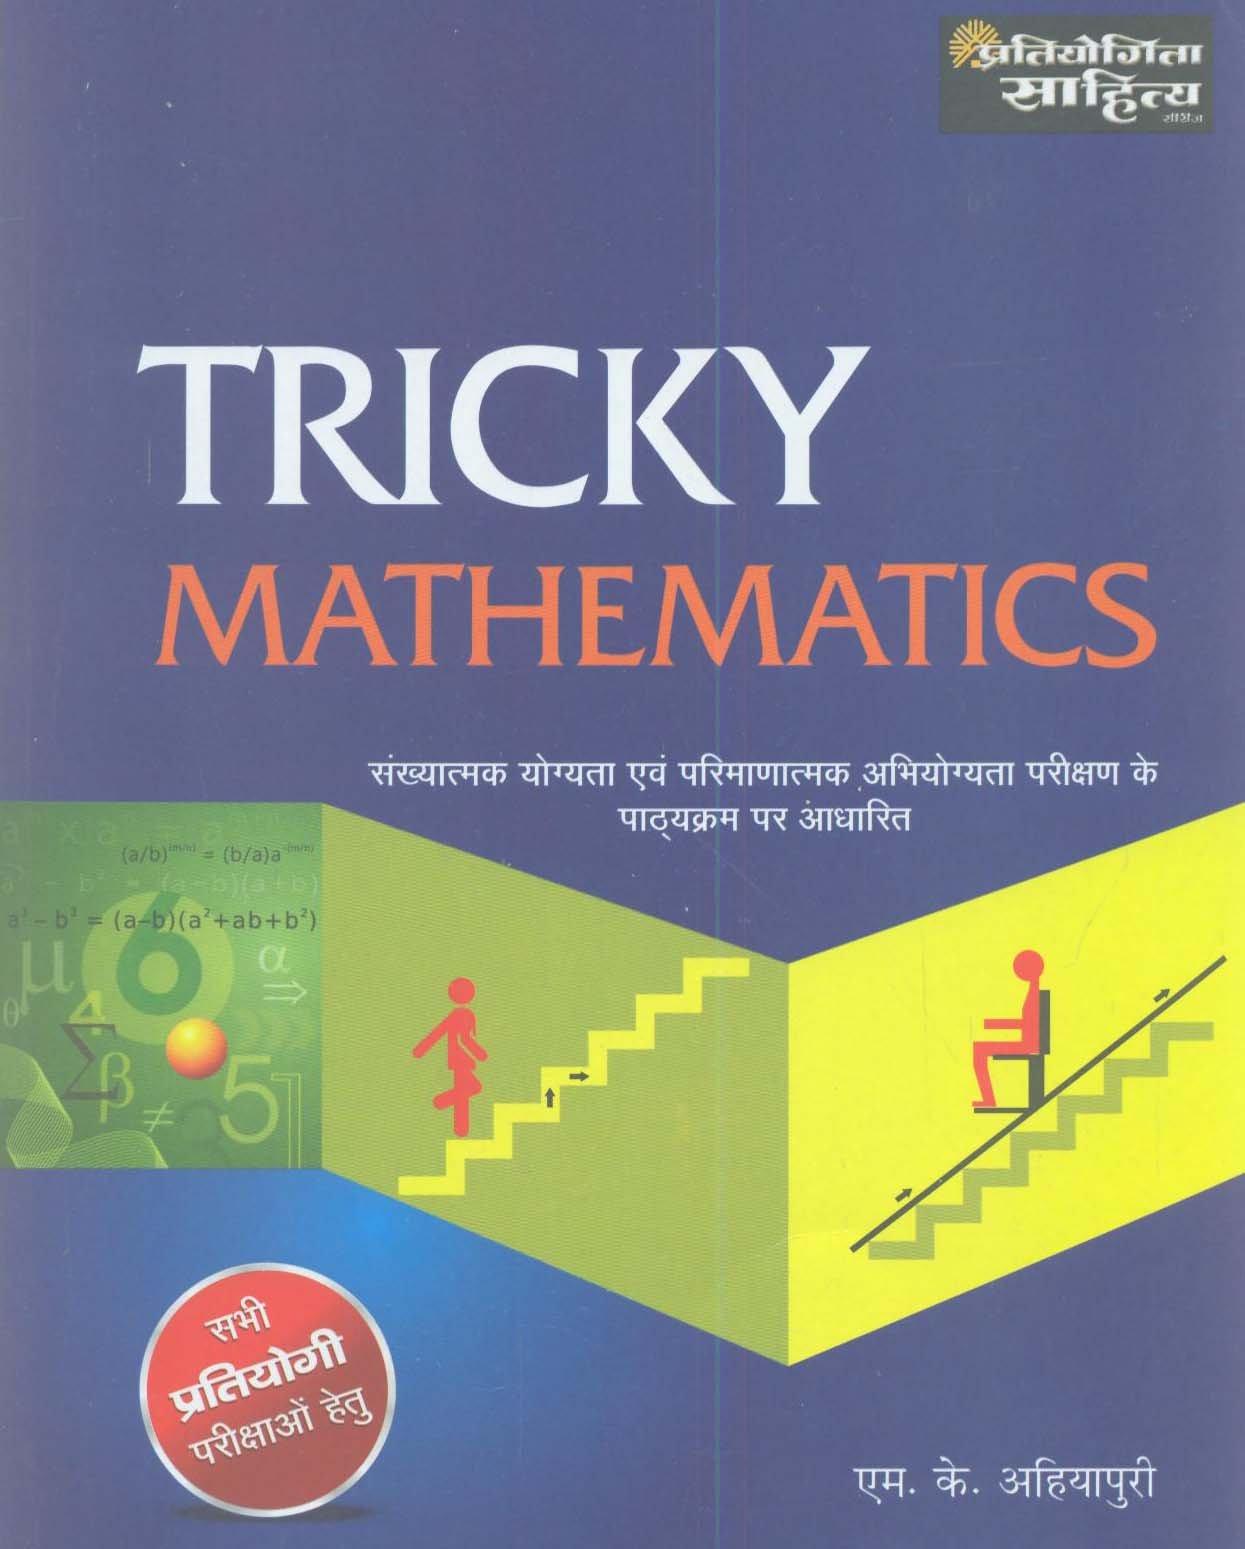 Buy Tricky Mathematics (Hindi Sanskarad) Book Online at Low Prices ...